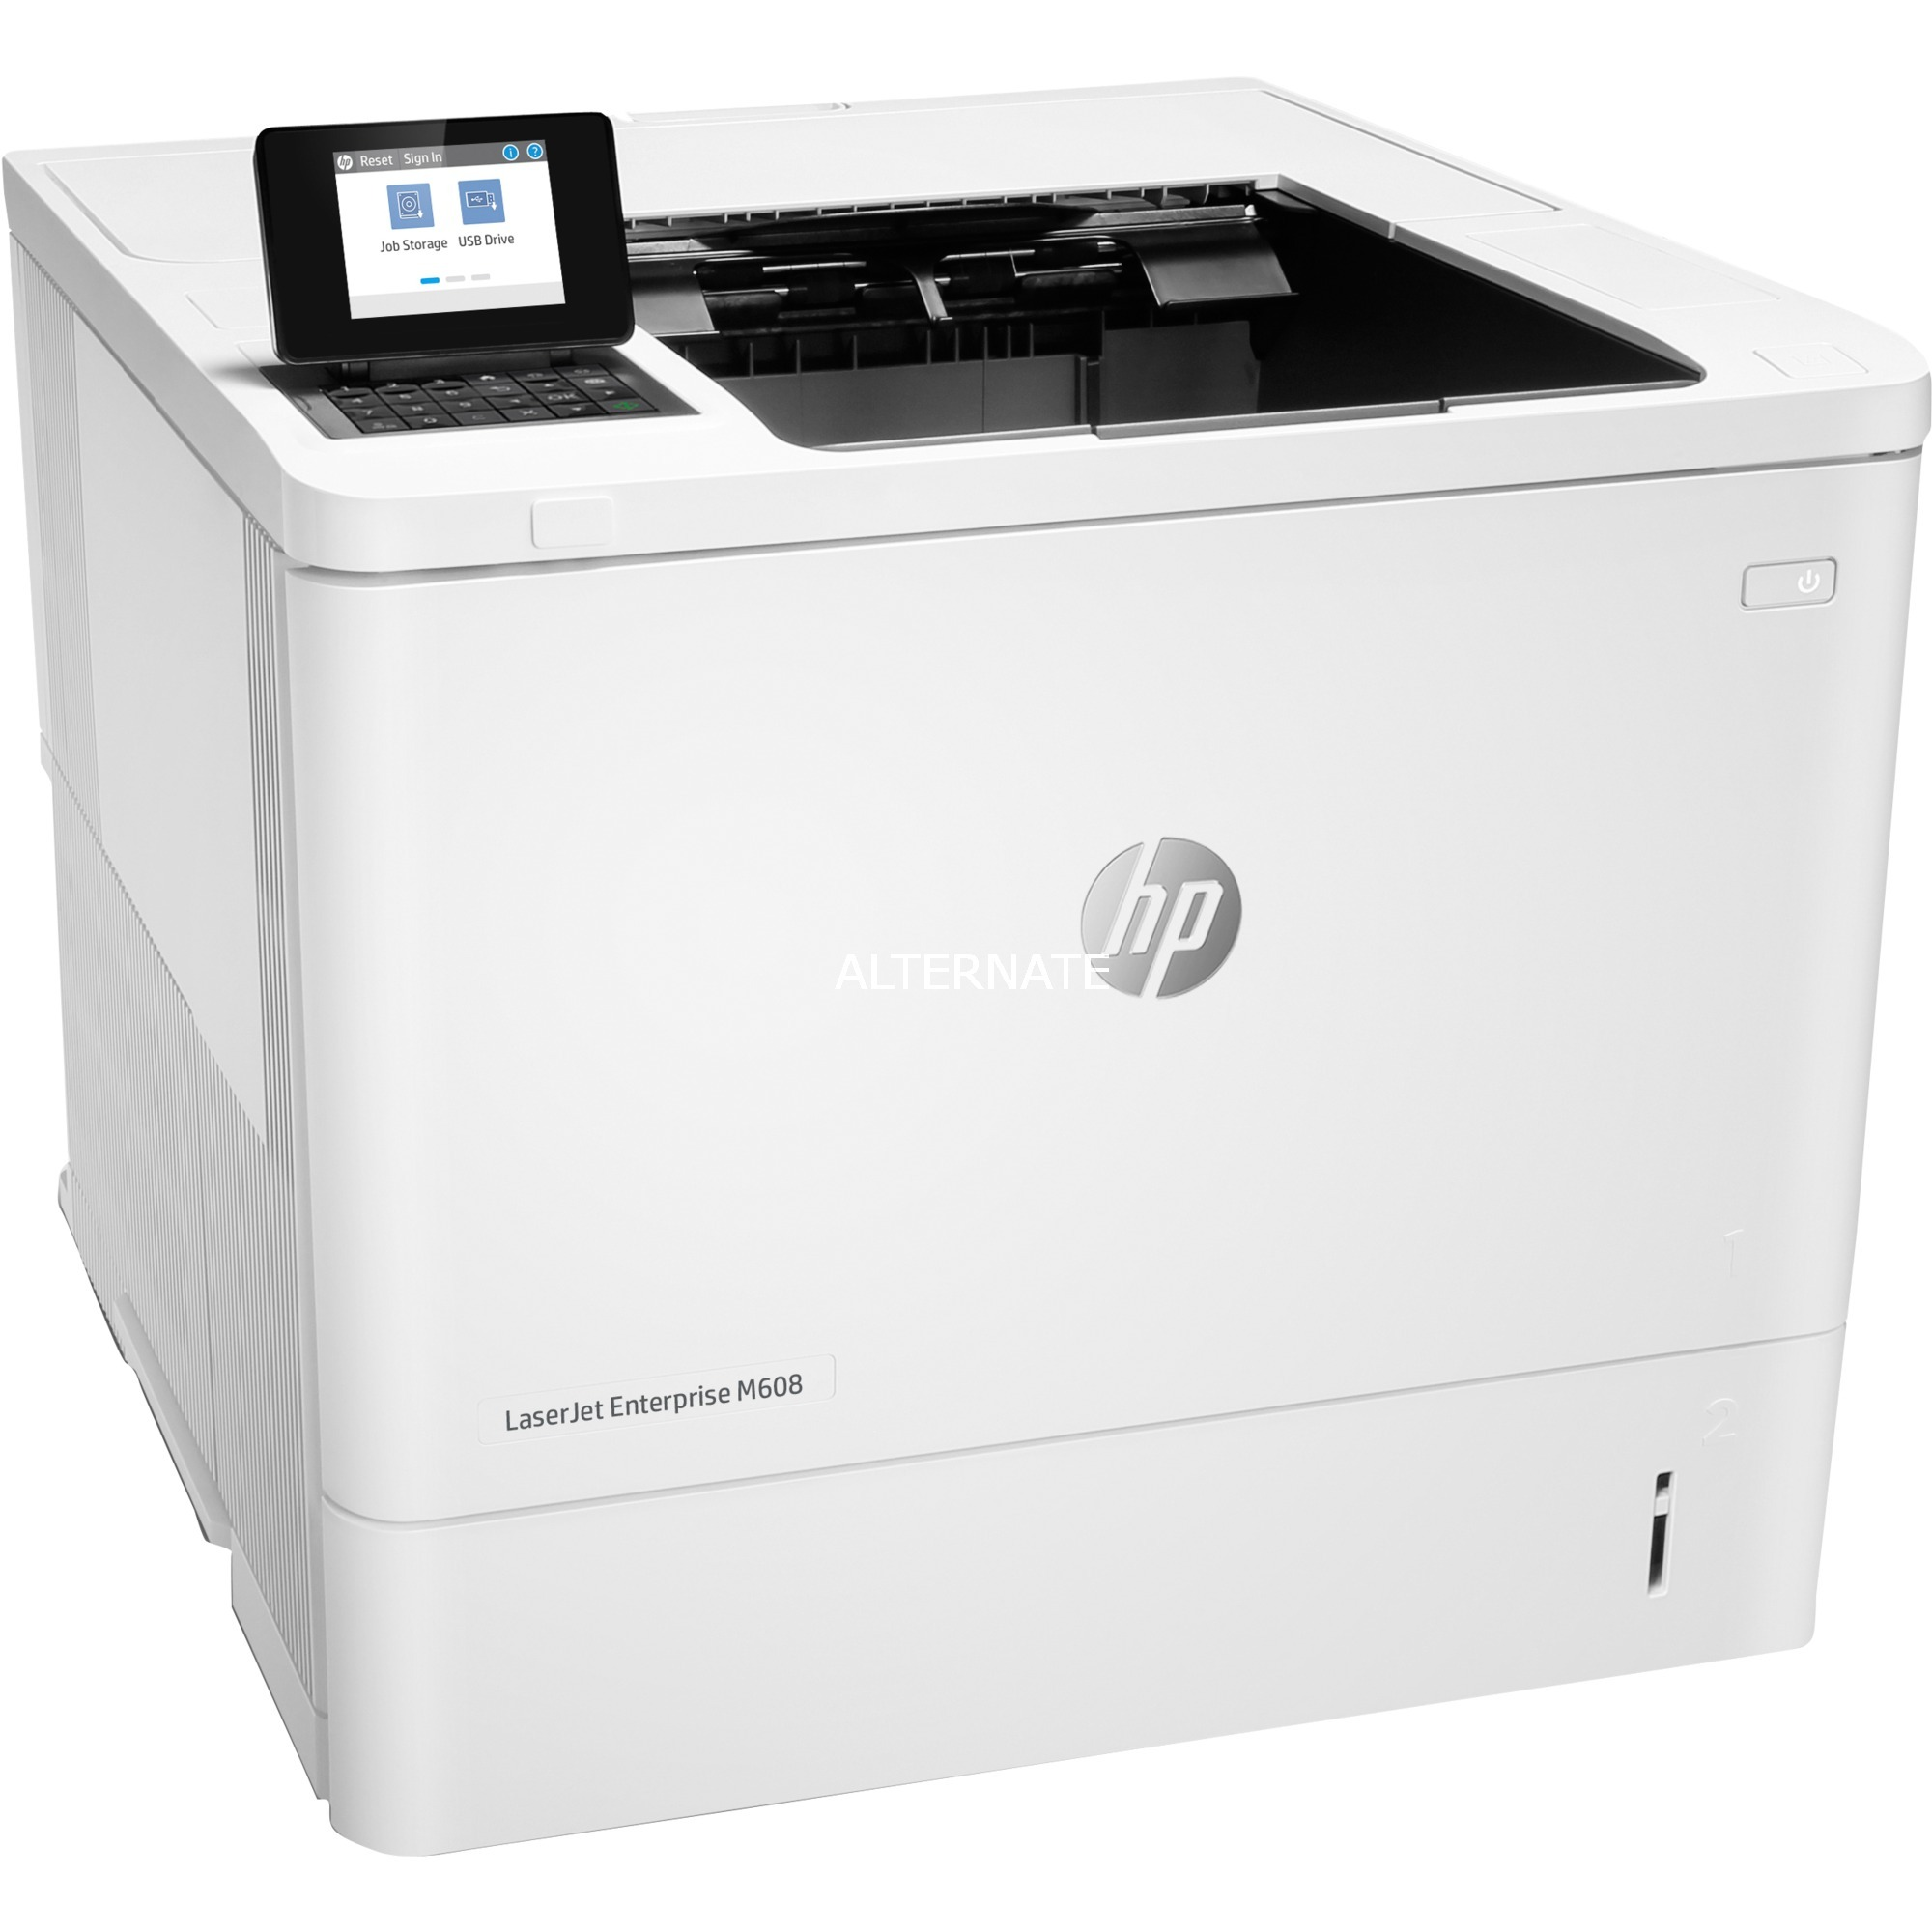 LaserJet Enterprise M608dn 1200 x 1200 DPI A4, Impresora láser